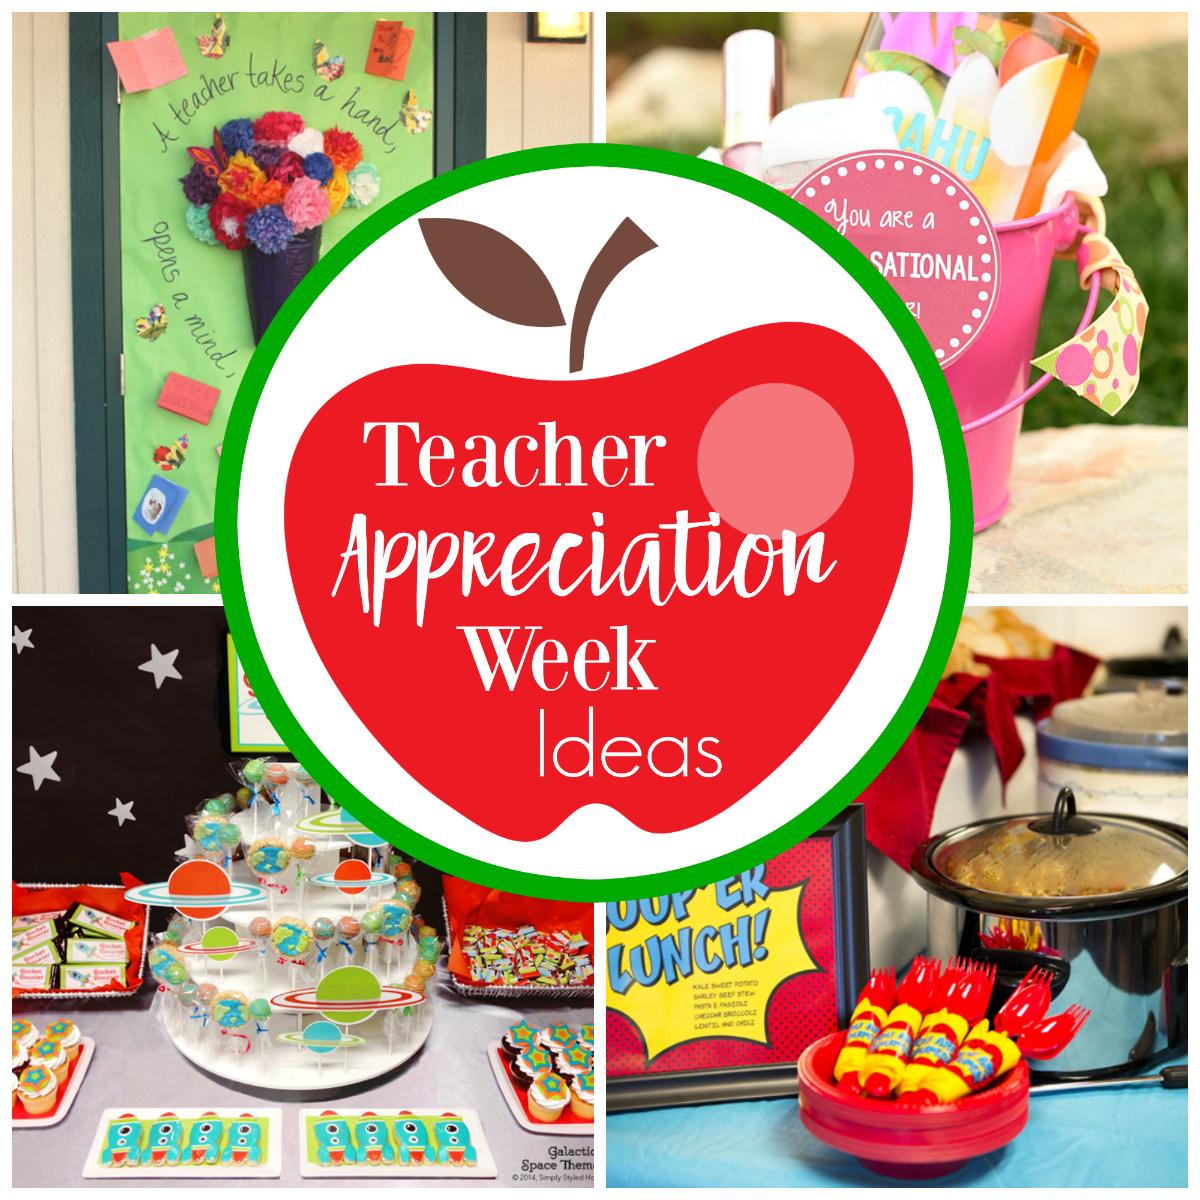 Teacher Appreciation Week Free Download Clip Art.